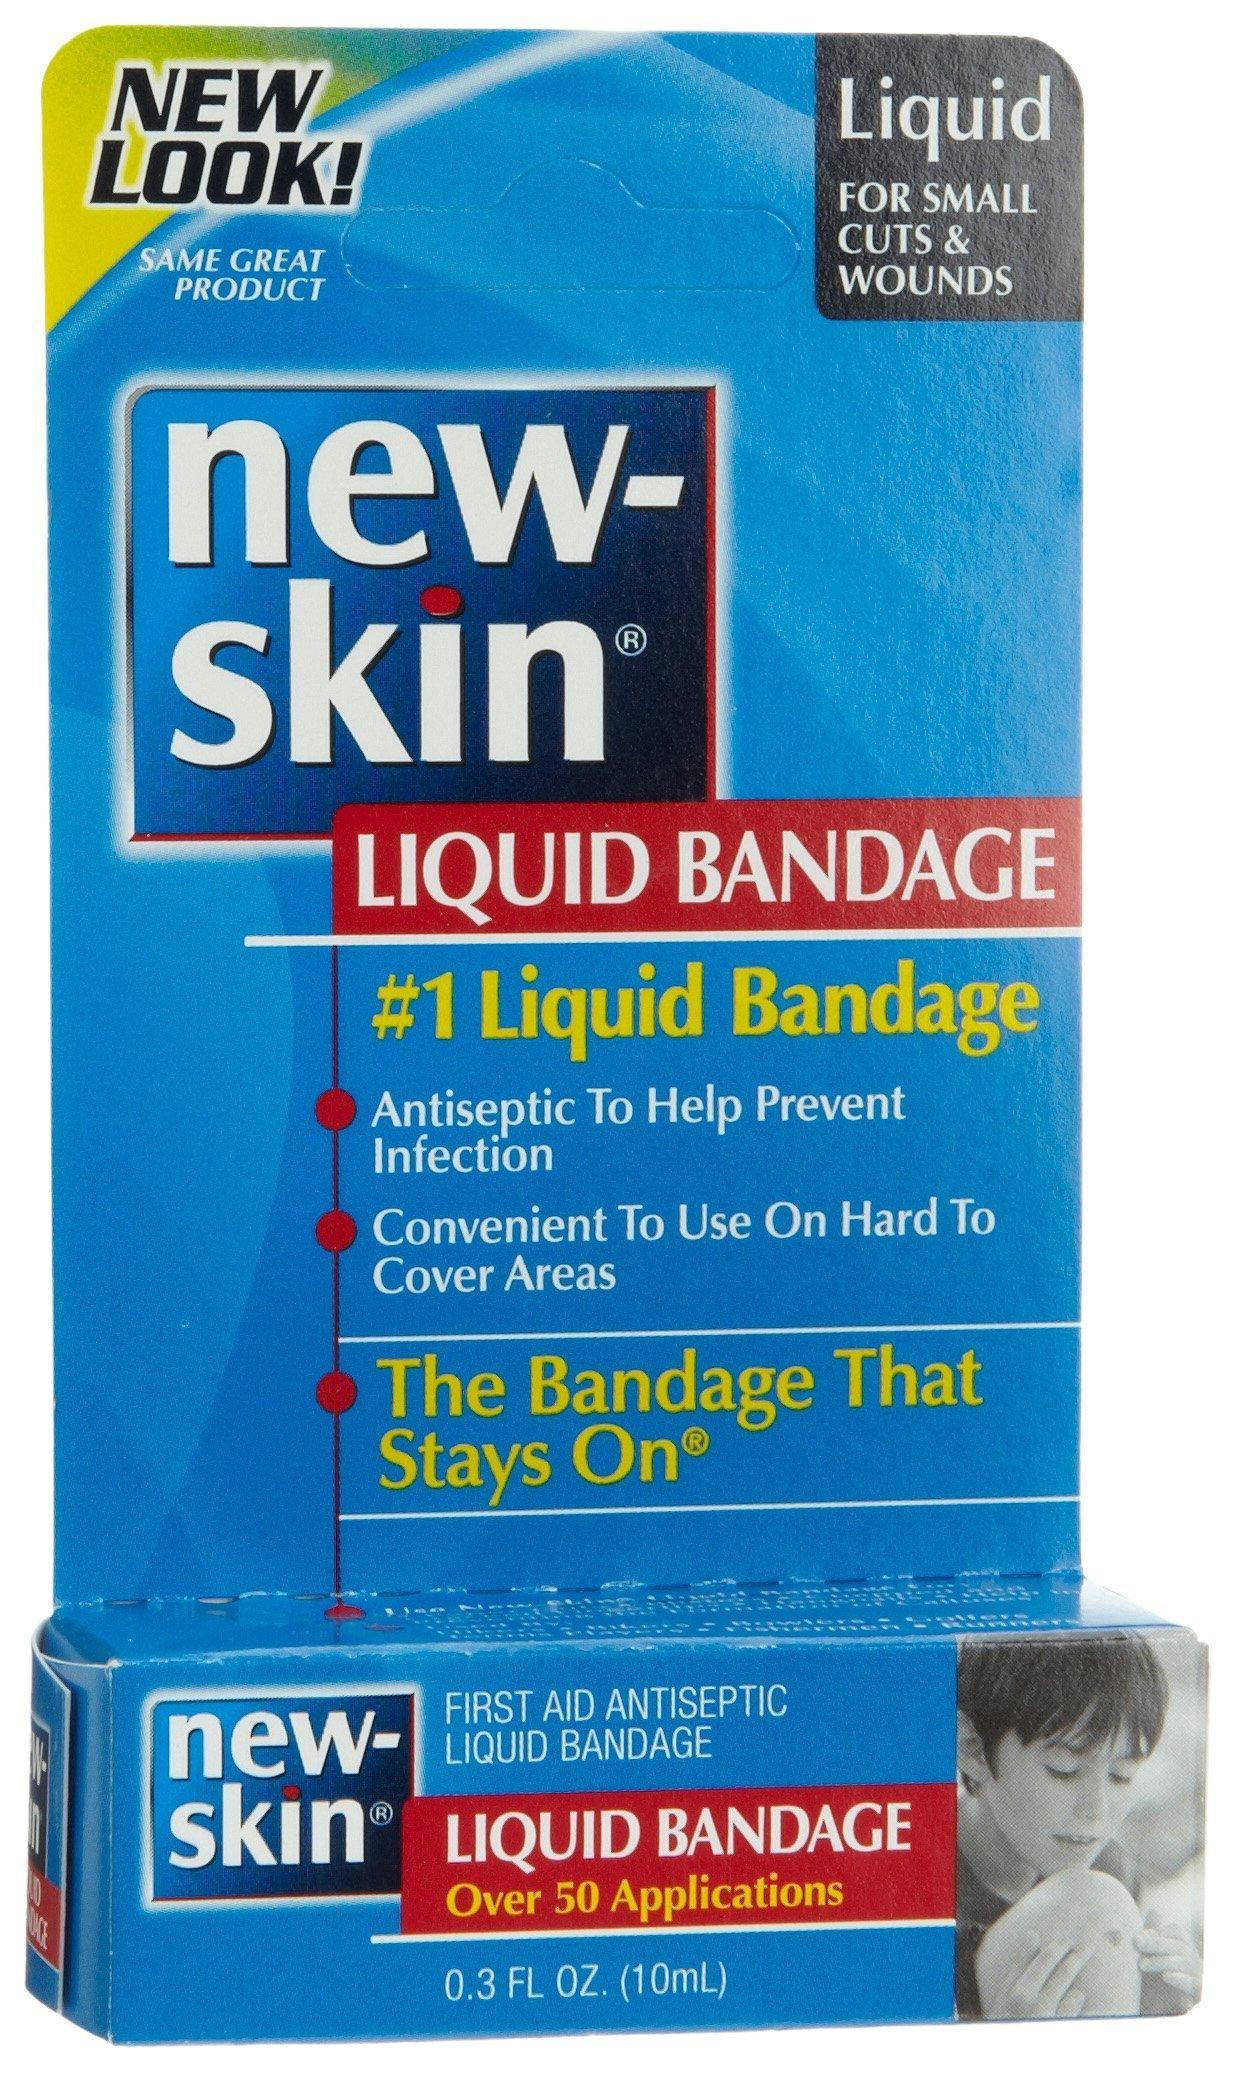 New-skin Antiseptic Liquid Bandage - 0.3 Oz (Pack of 6) by New-Skin